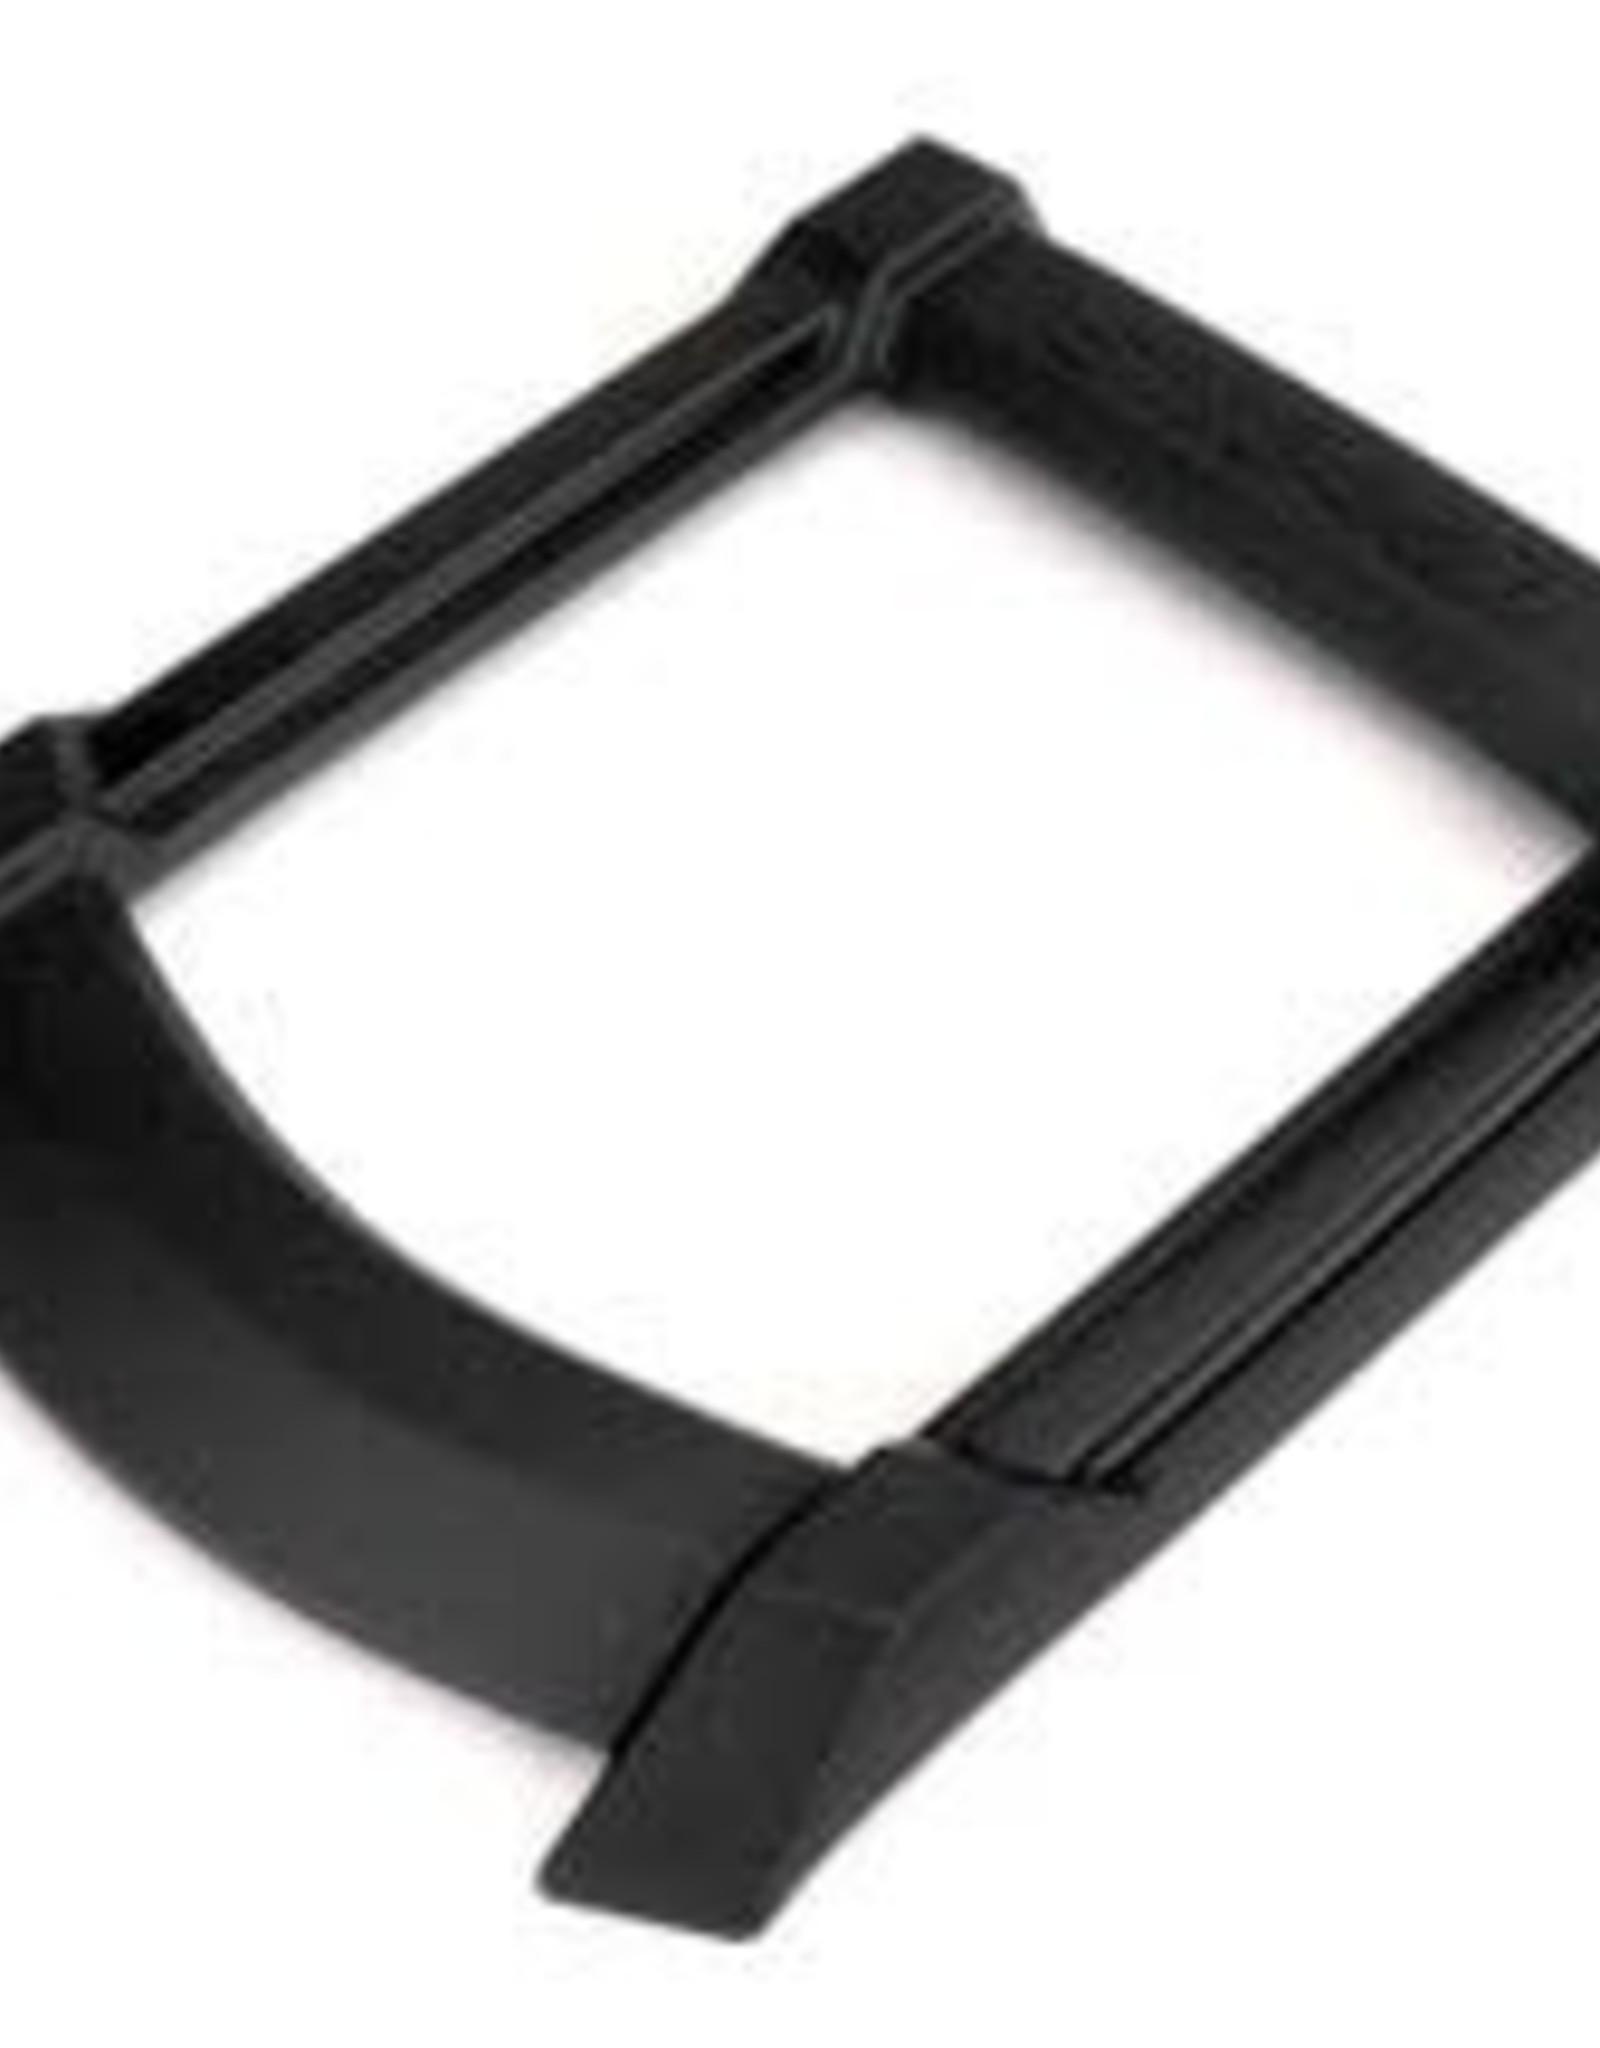 TRAXXAS SKID PLATE ROOF BLACK